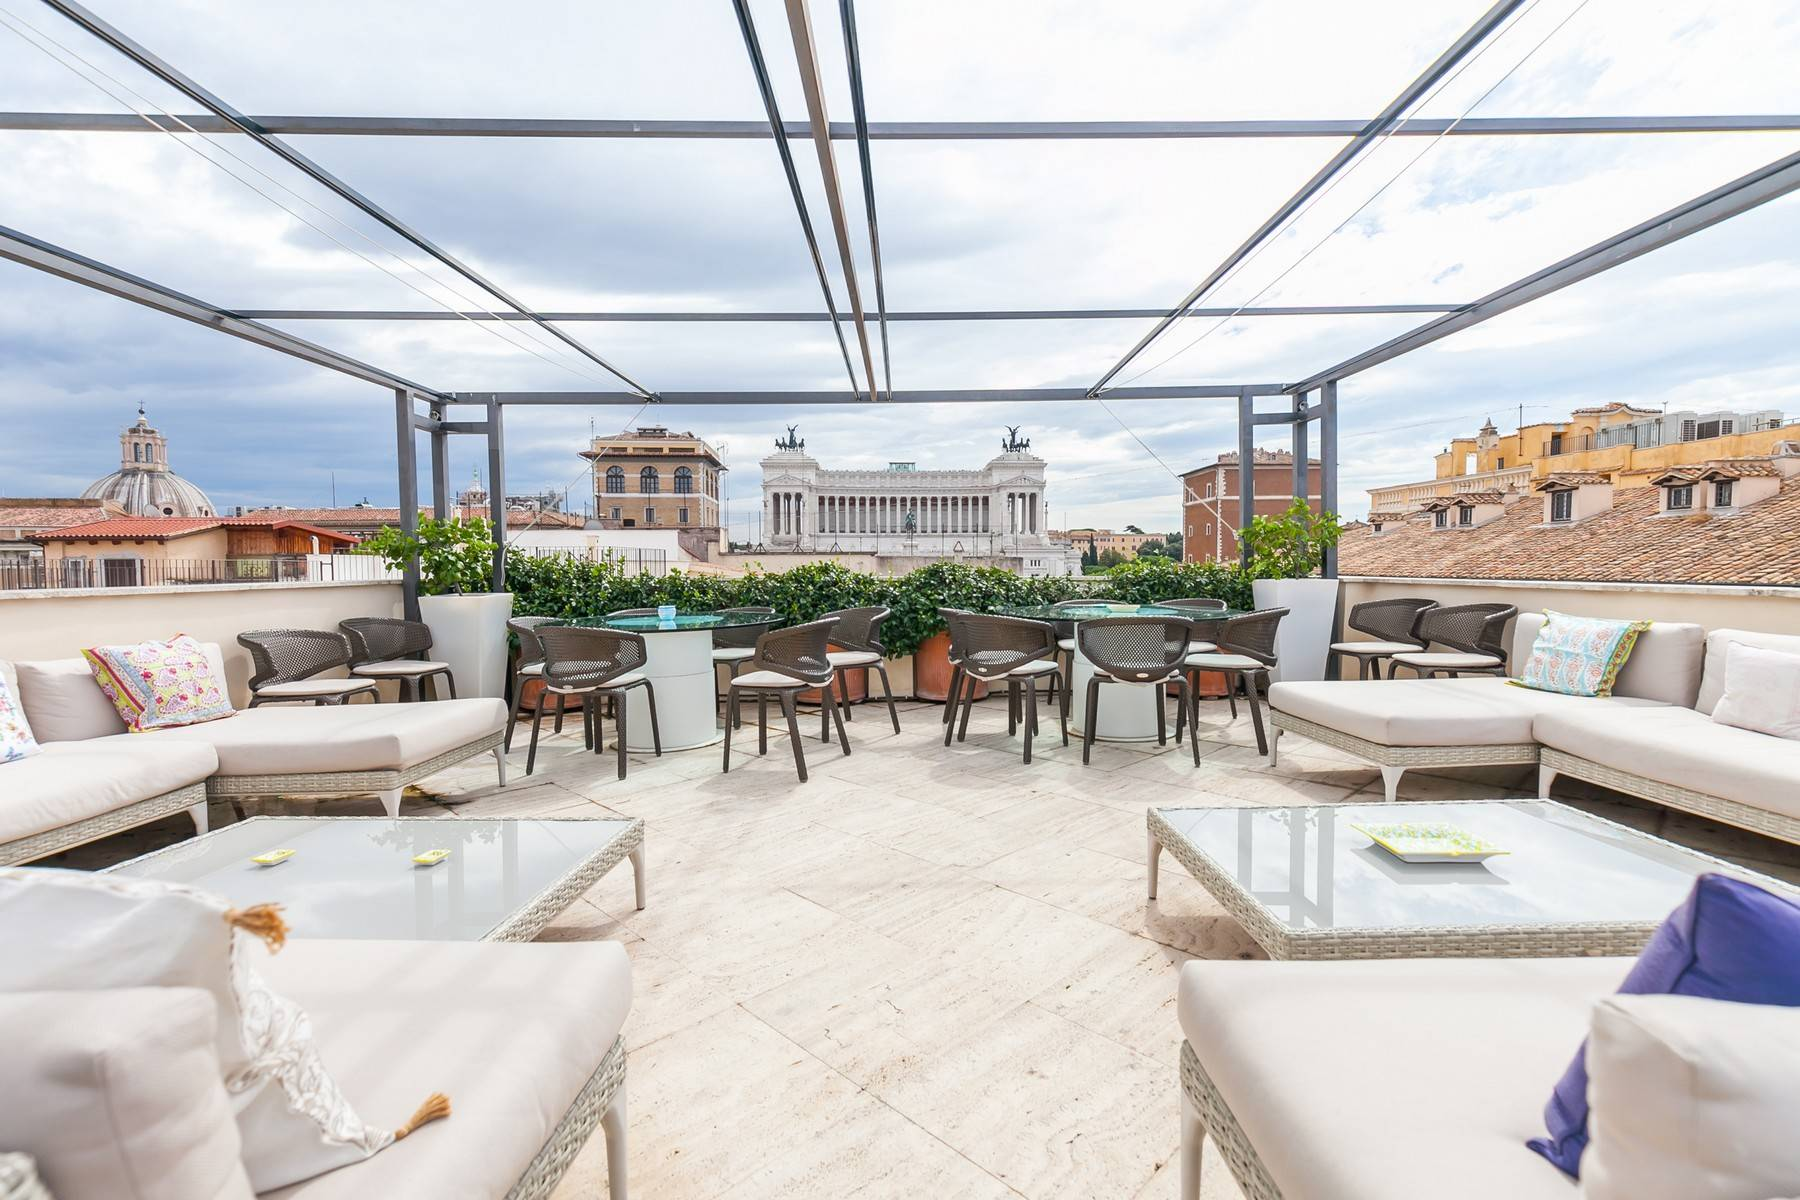 Apartments 为 出租 在 Elegant apartment overlooking the Vittoriano 罗马, 罗马 意大利